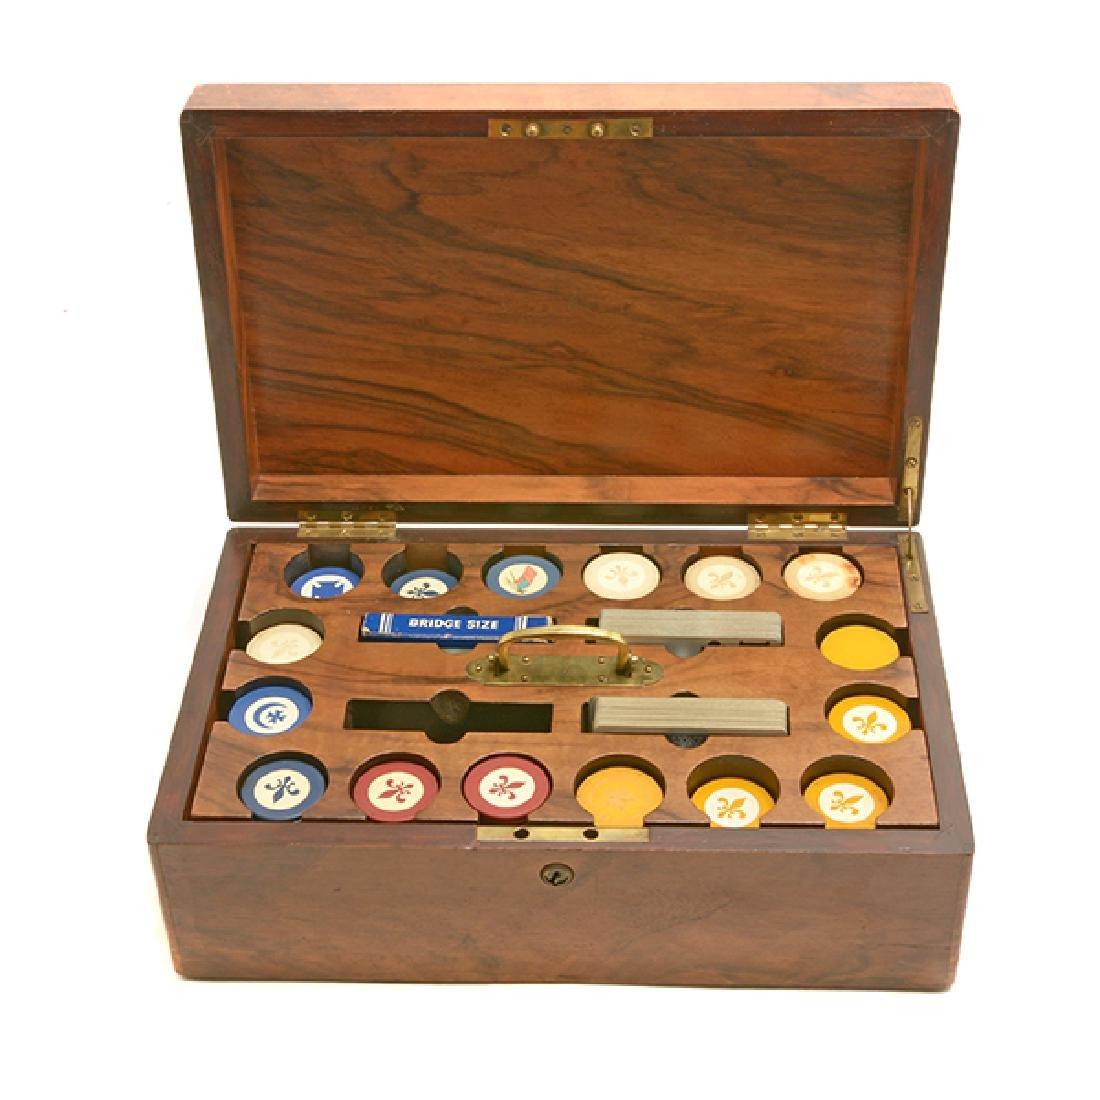 English Edwardian Poker Chip Set in Wood Case